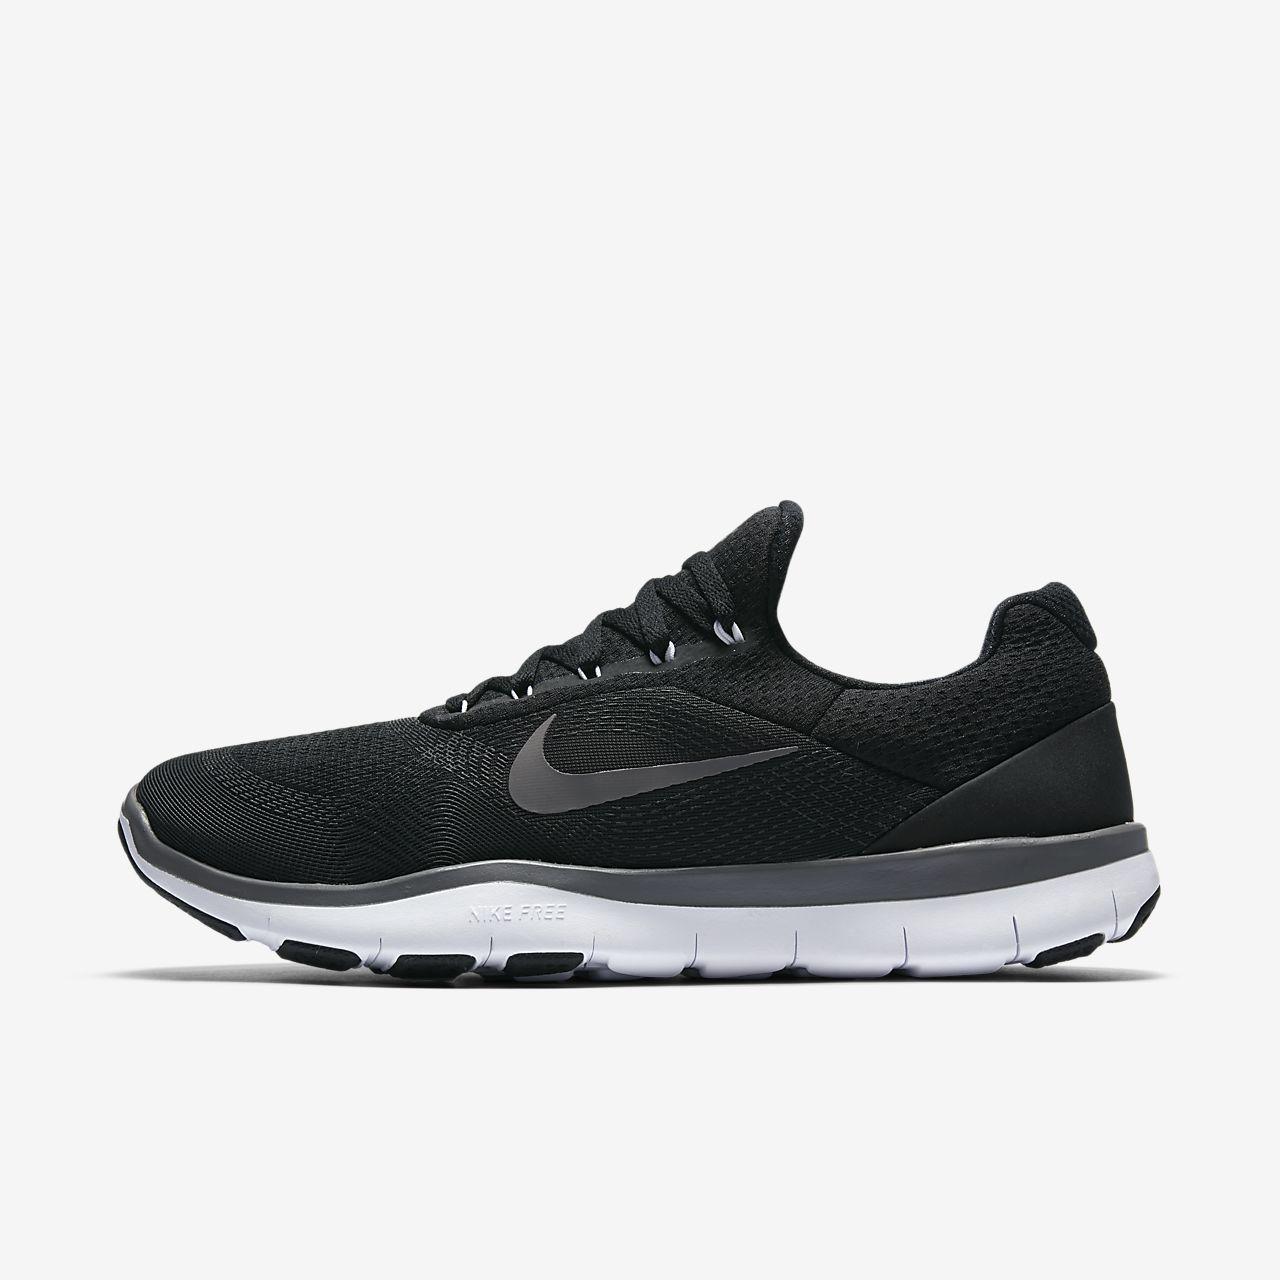 2016 Nike Sports Shoes for Men  Revolve 2 Black Running Shoes Outlet